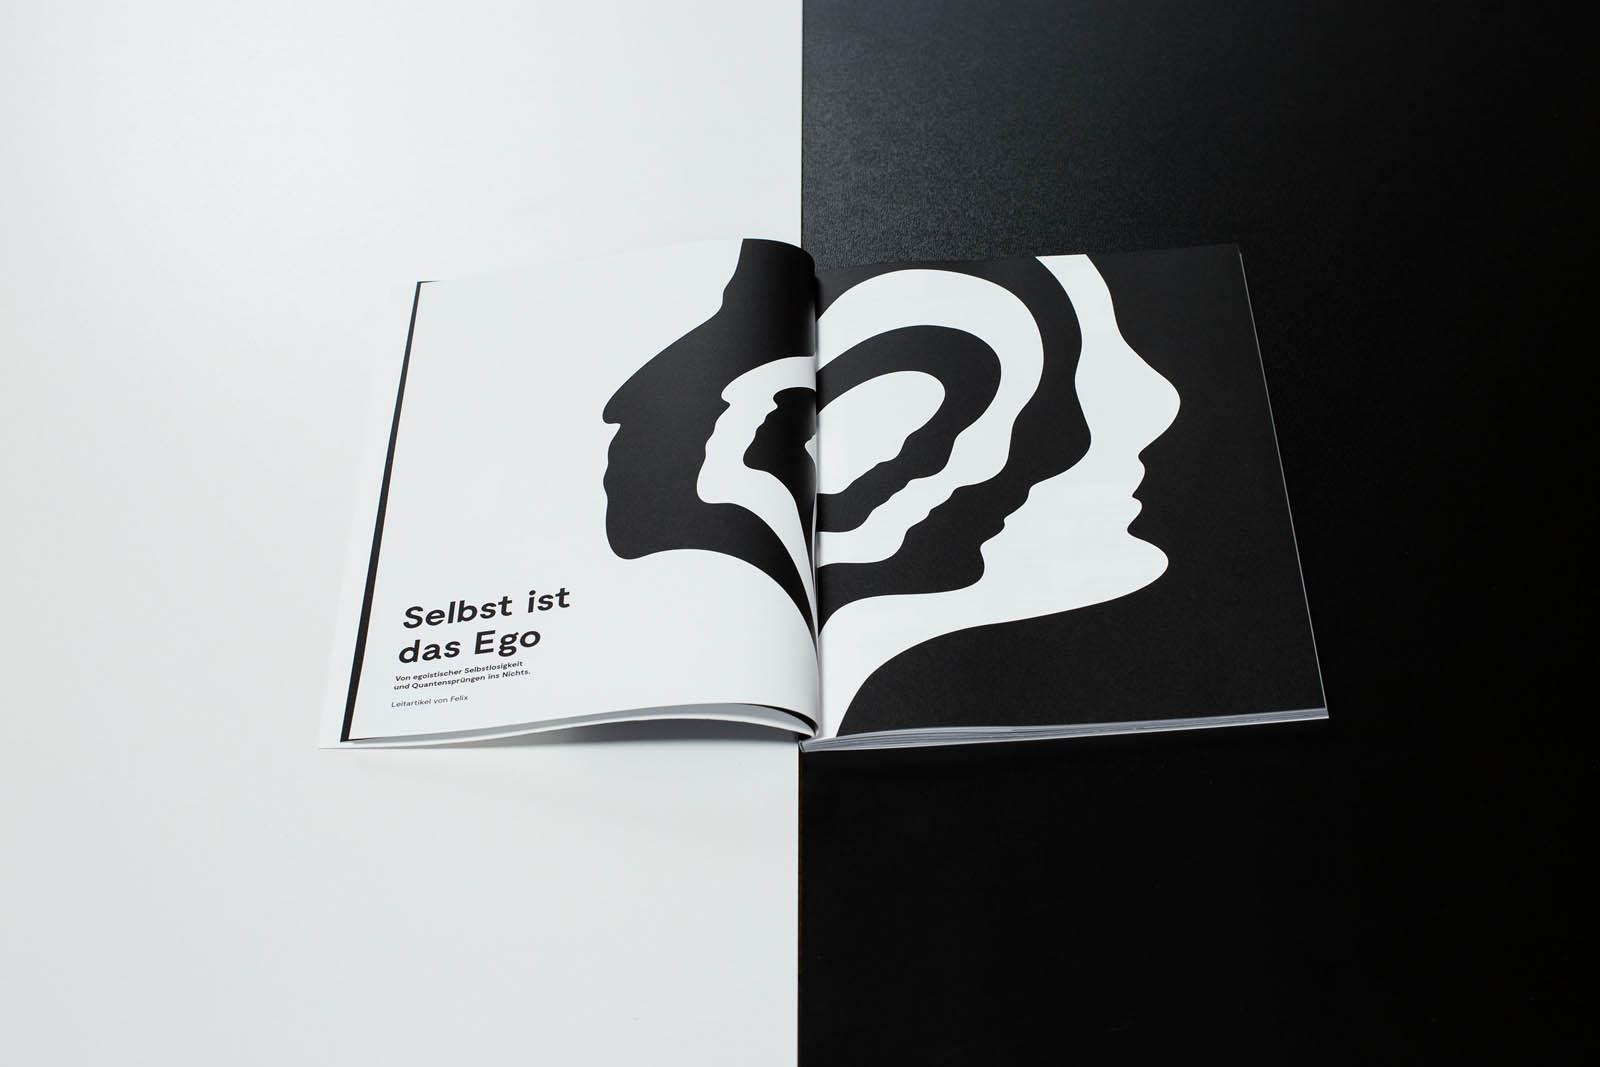 exit ego